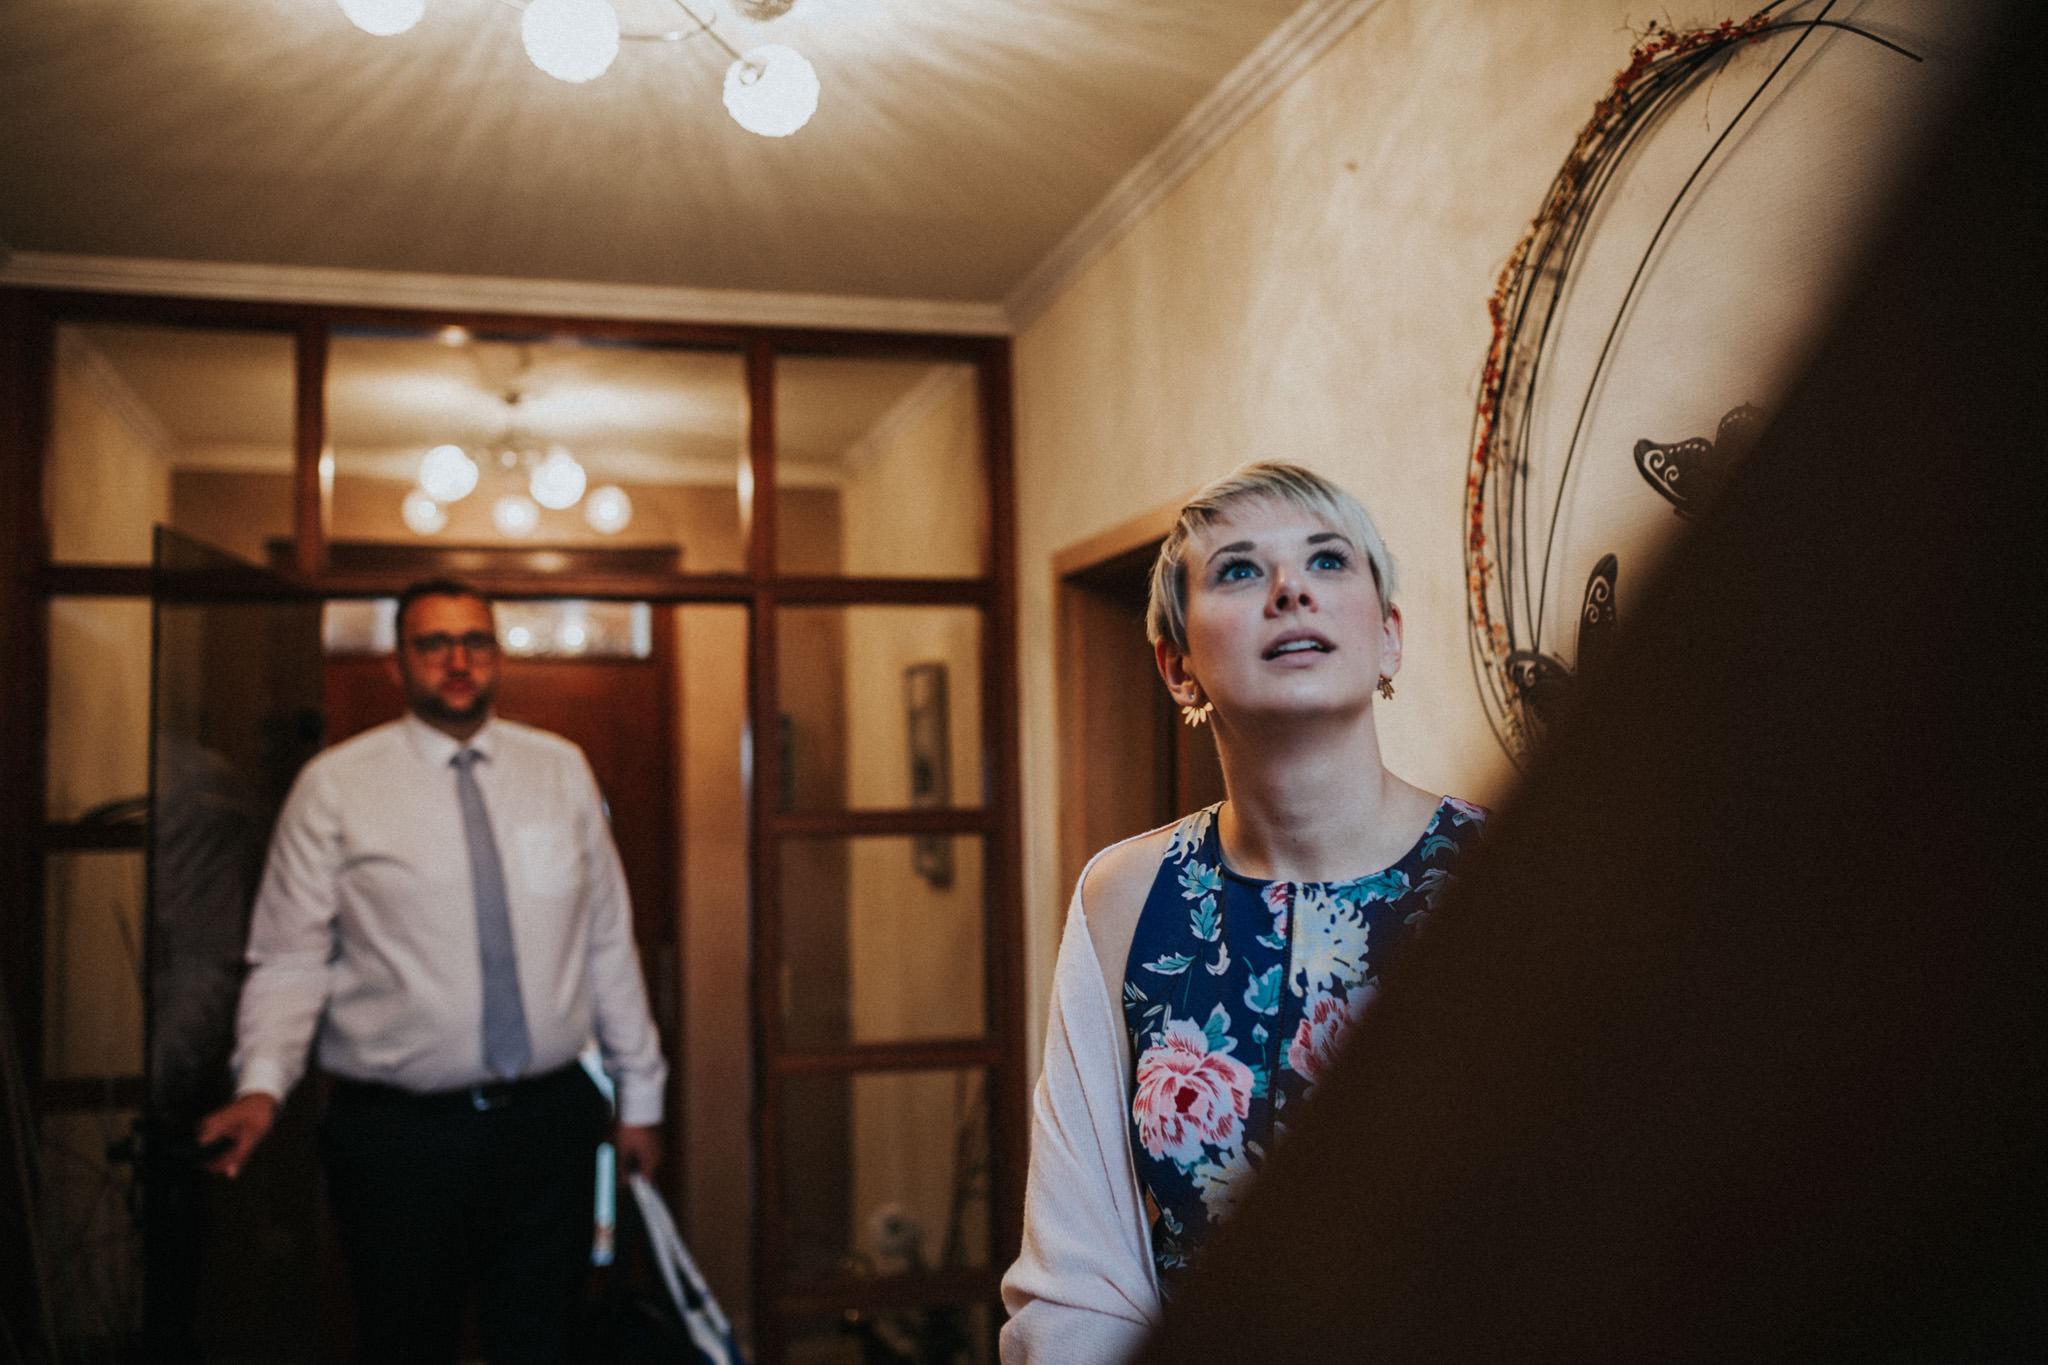 Hochzeitsfotograf-Homberg-23.jpg